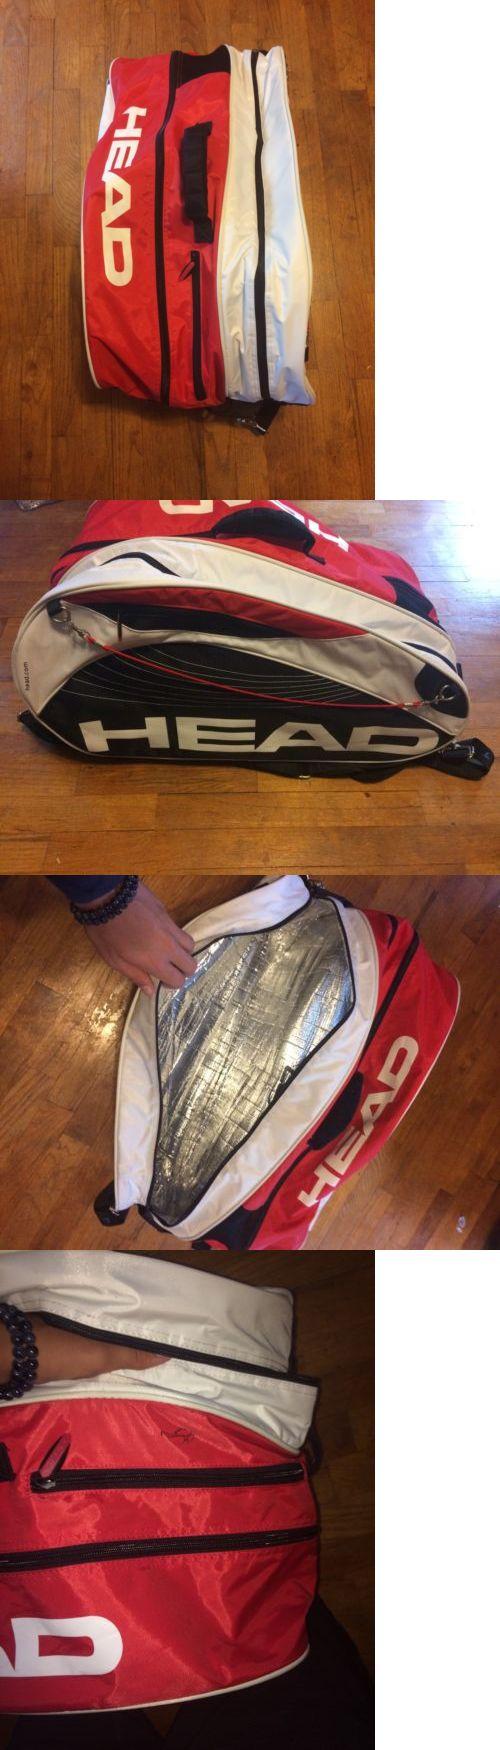 Bags 20869: Head Tennis Bag -> BUY IT NOW ONLY: $30 on eBay!